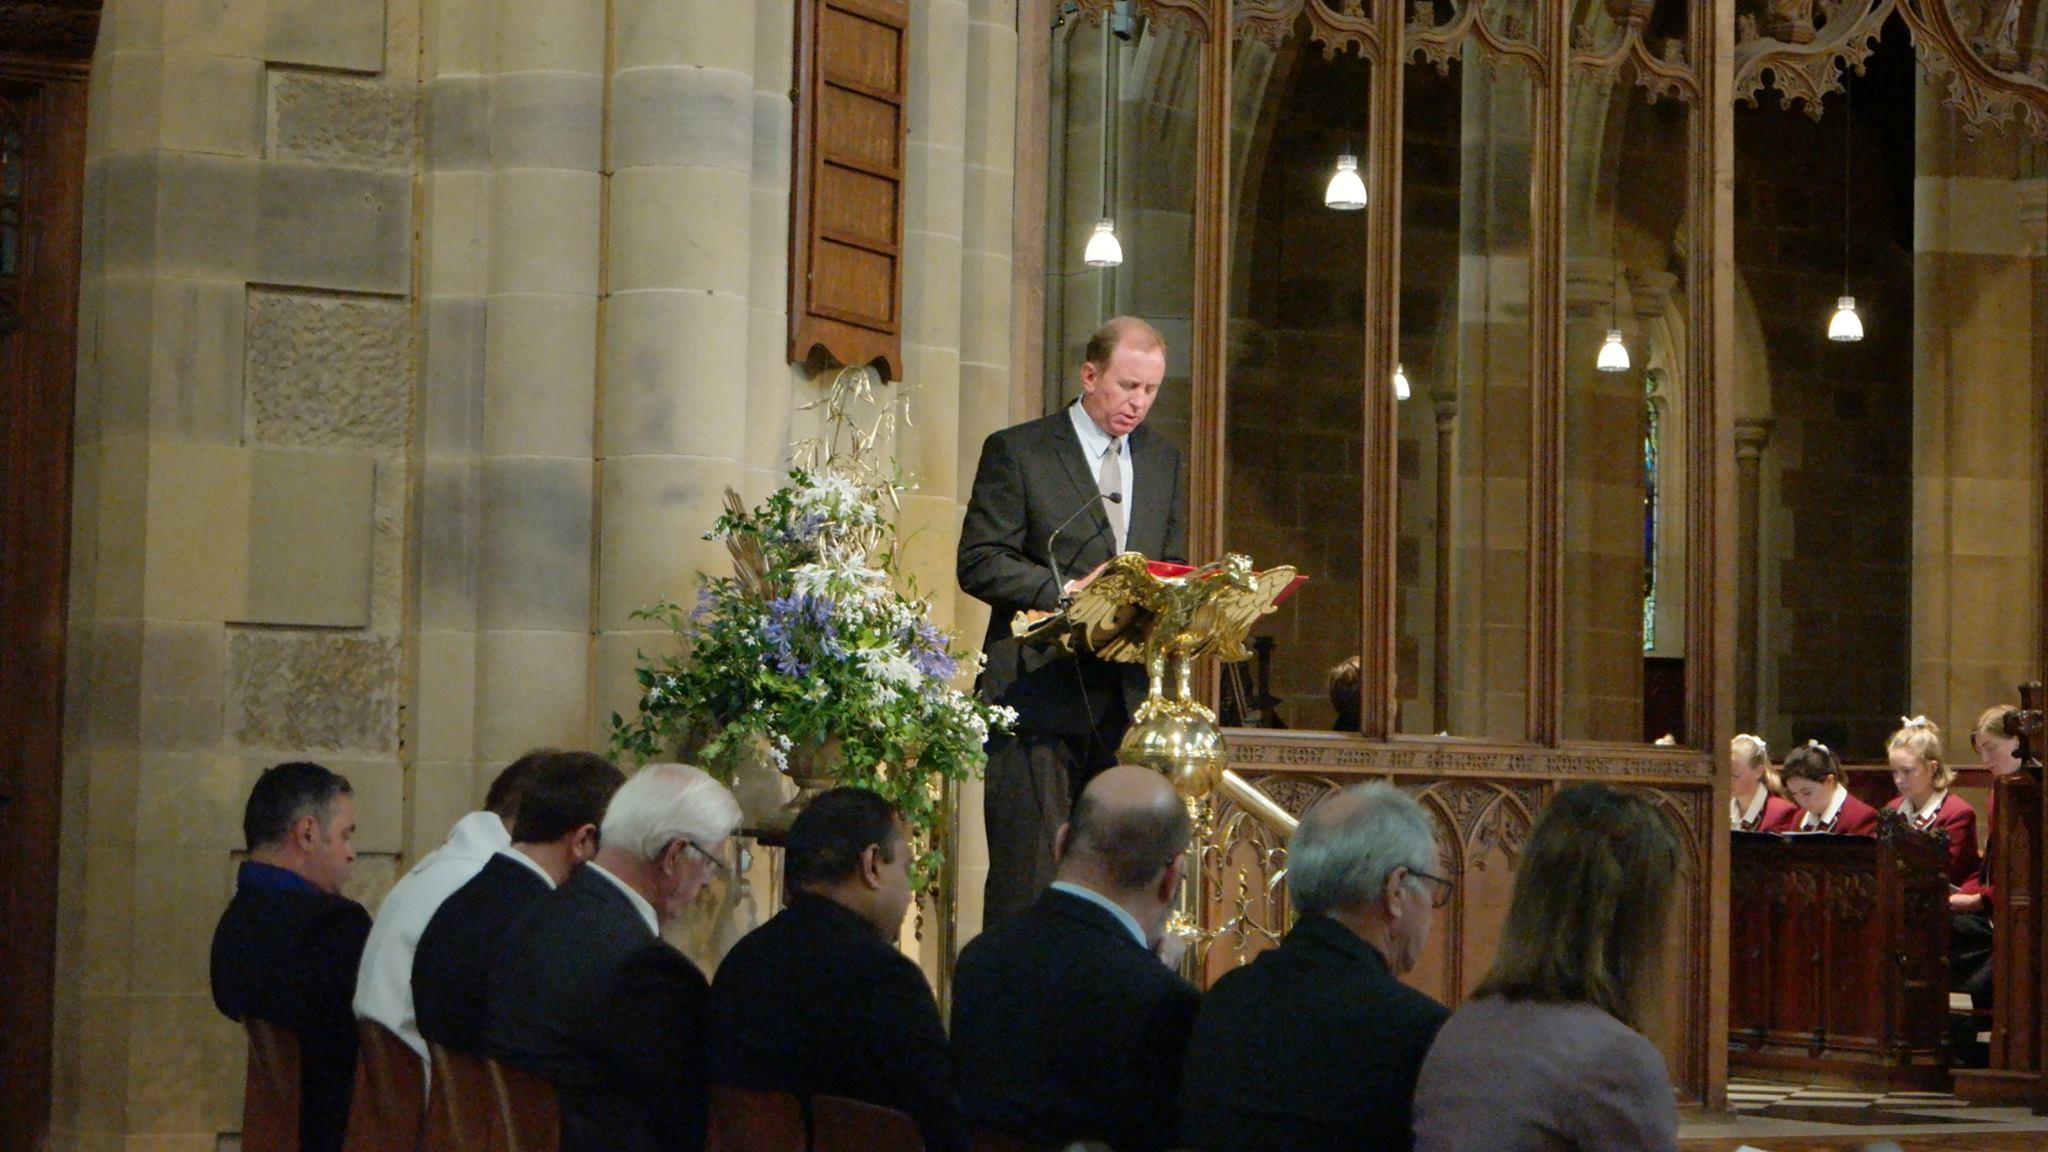 Dr. Andrew Corbett, St. David's Cathedral, Hobart Tasmania 2017